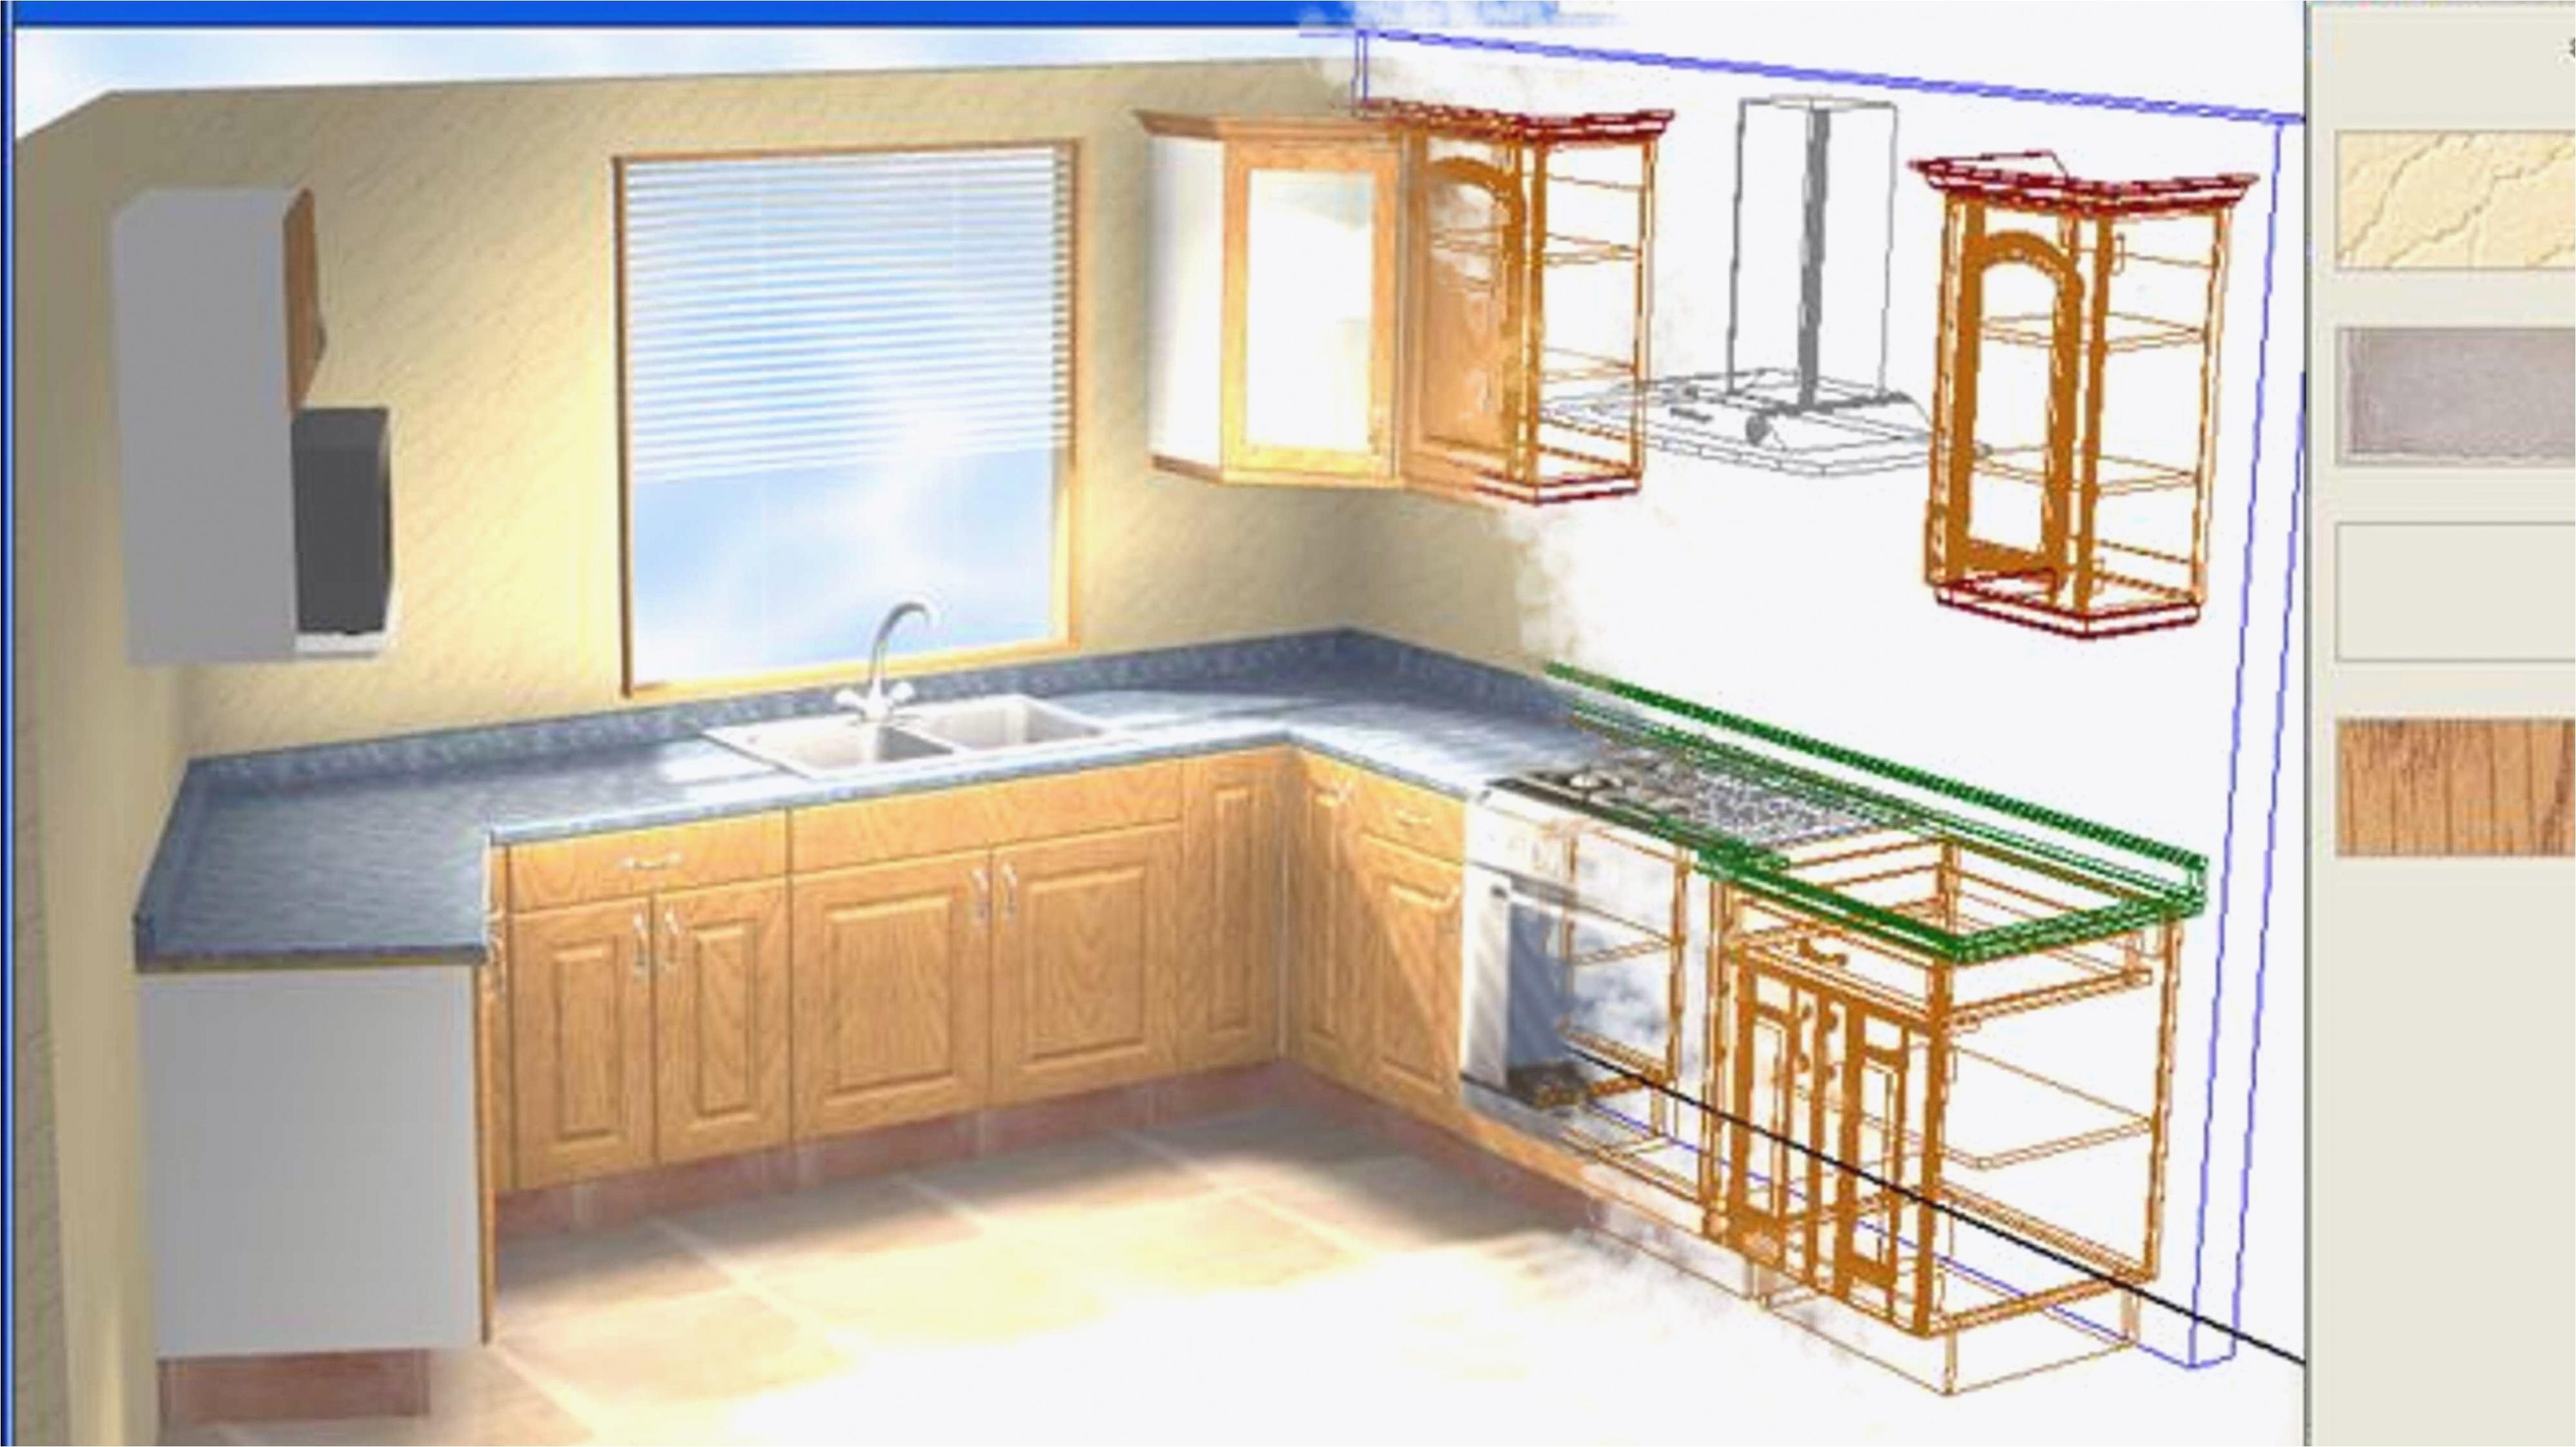 Programa Diseño Muebles Gratis Irdz Diseà O De Cocinas 3d Gratis ...